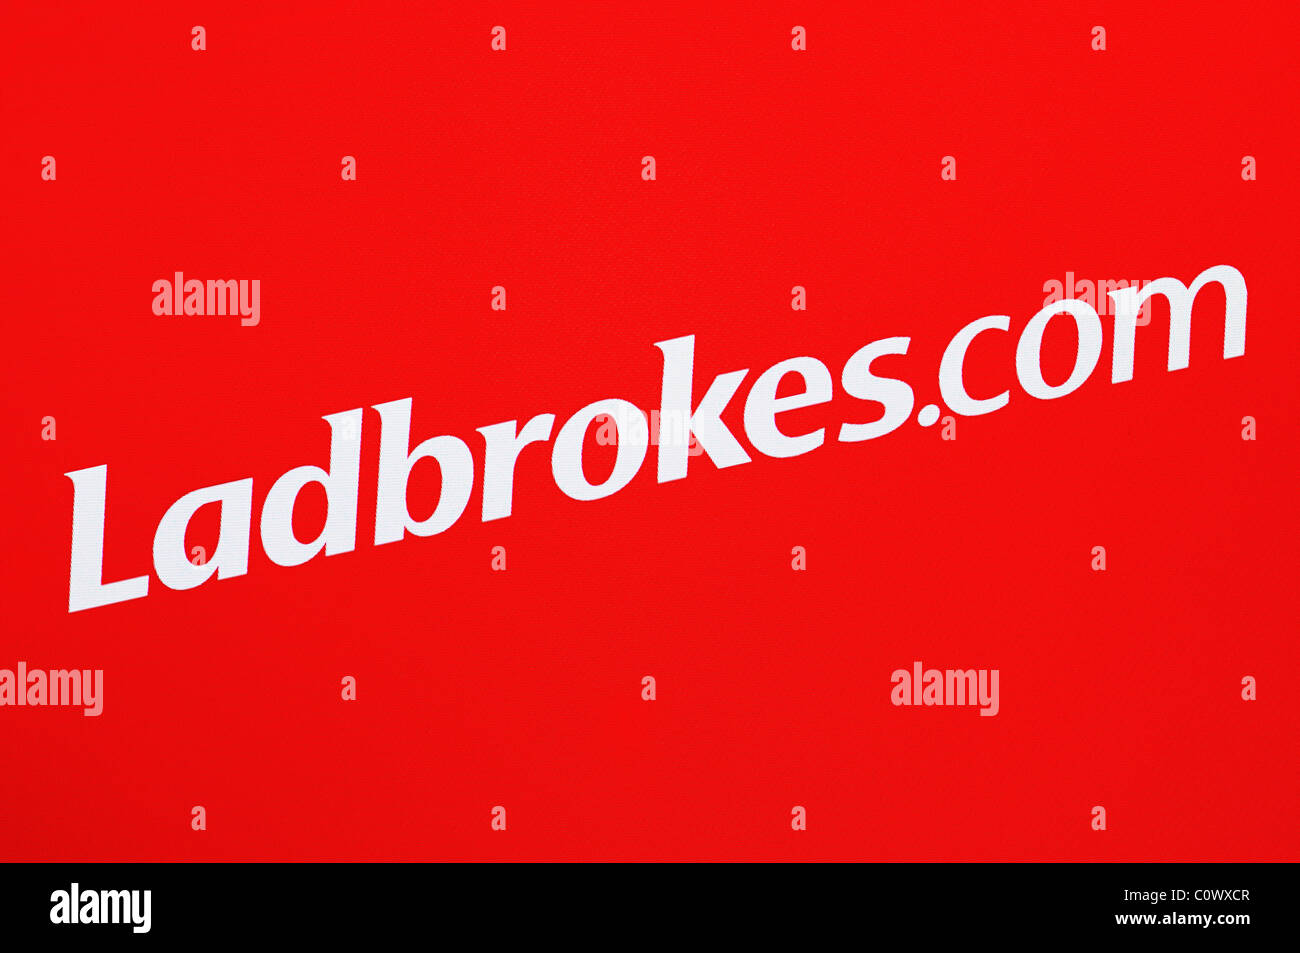 Ladbrokes Screenshot. Ladbrokes.com is the Internet Version of the Bookmaker. - Stock Image